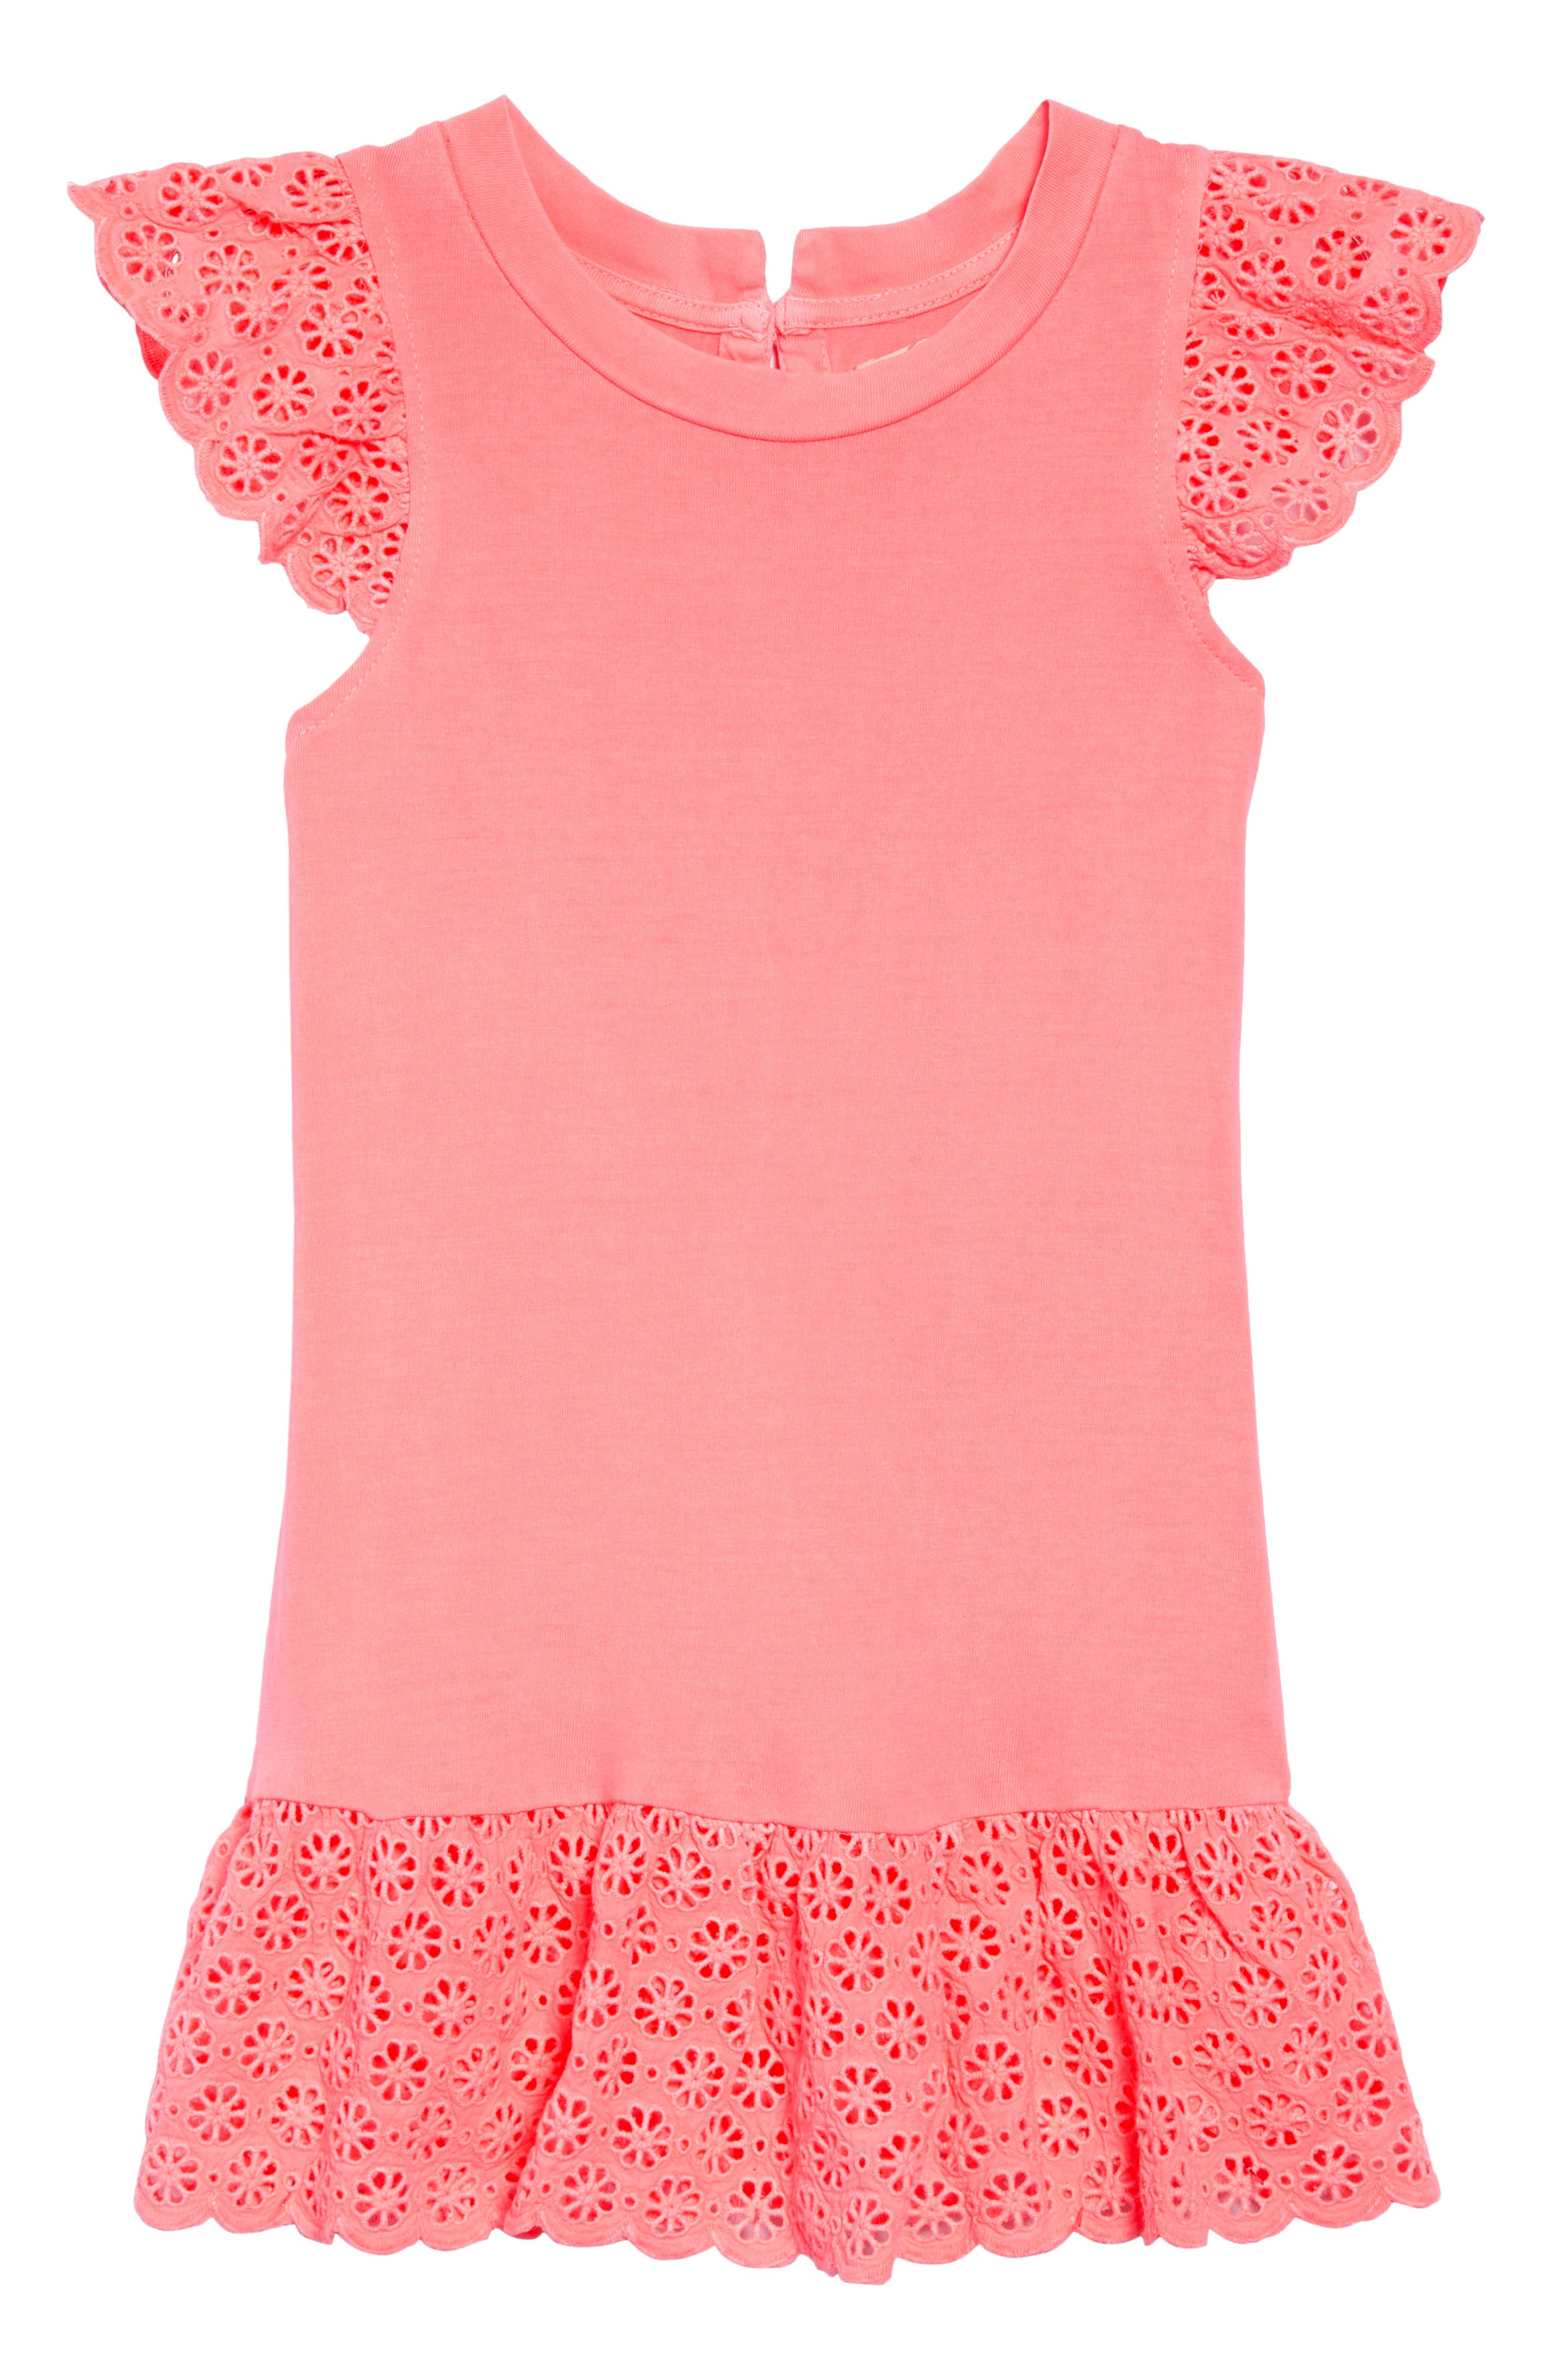 Ashley Dress,                             Main thumbnail 1, color,                             Neon Coral